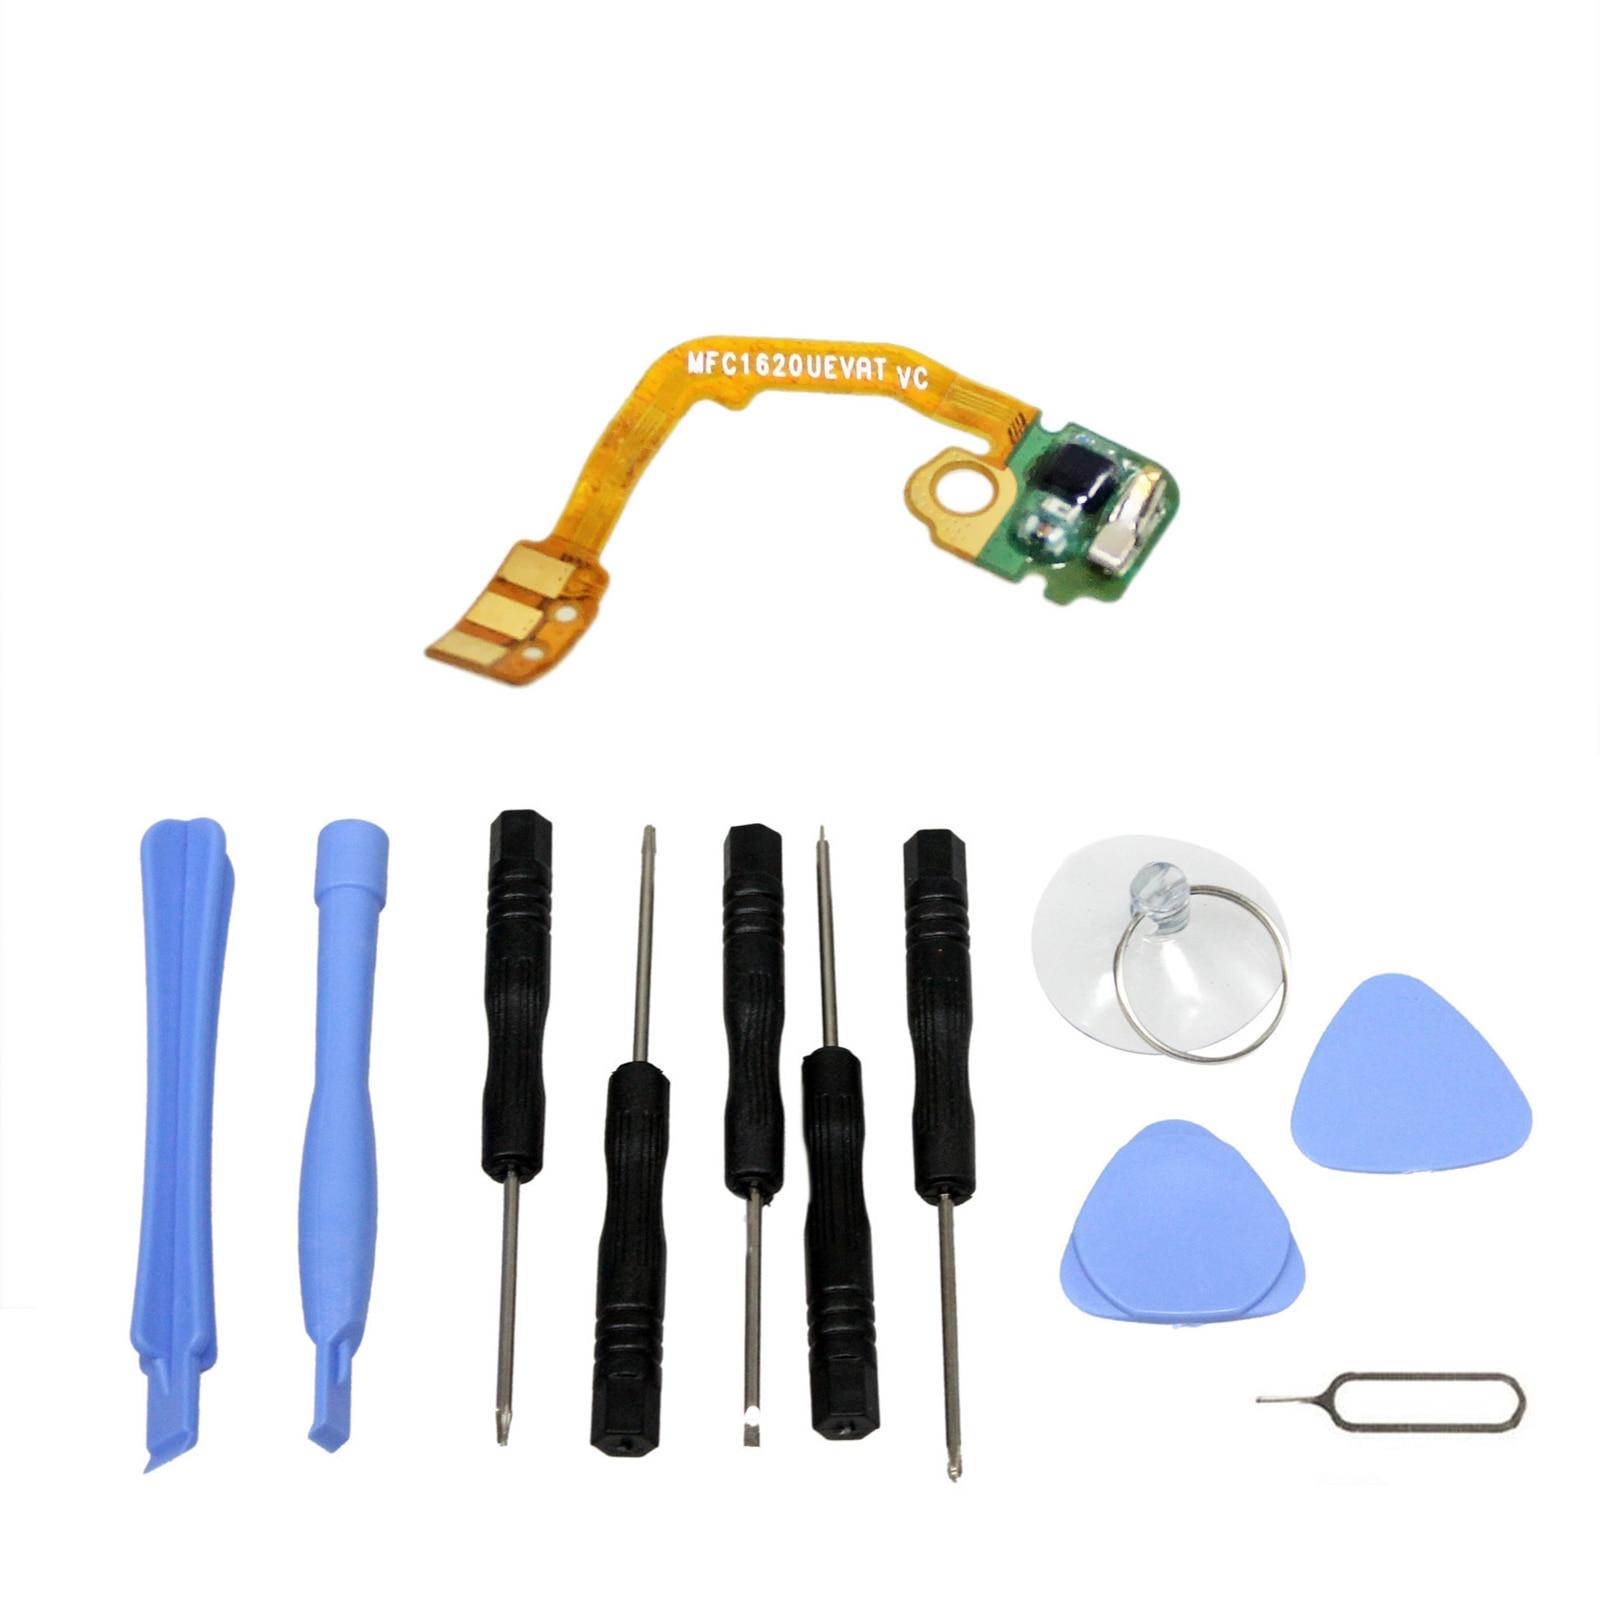 Para Huawei P9 EVA-L09 Módulo de antena WiFi WLAN Signal Flex Cable...